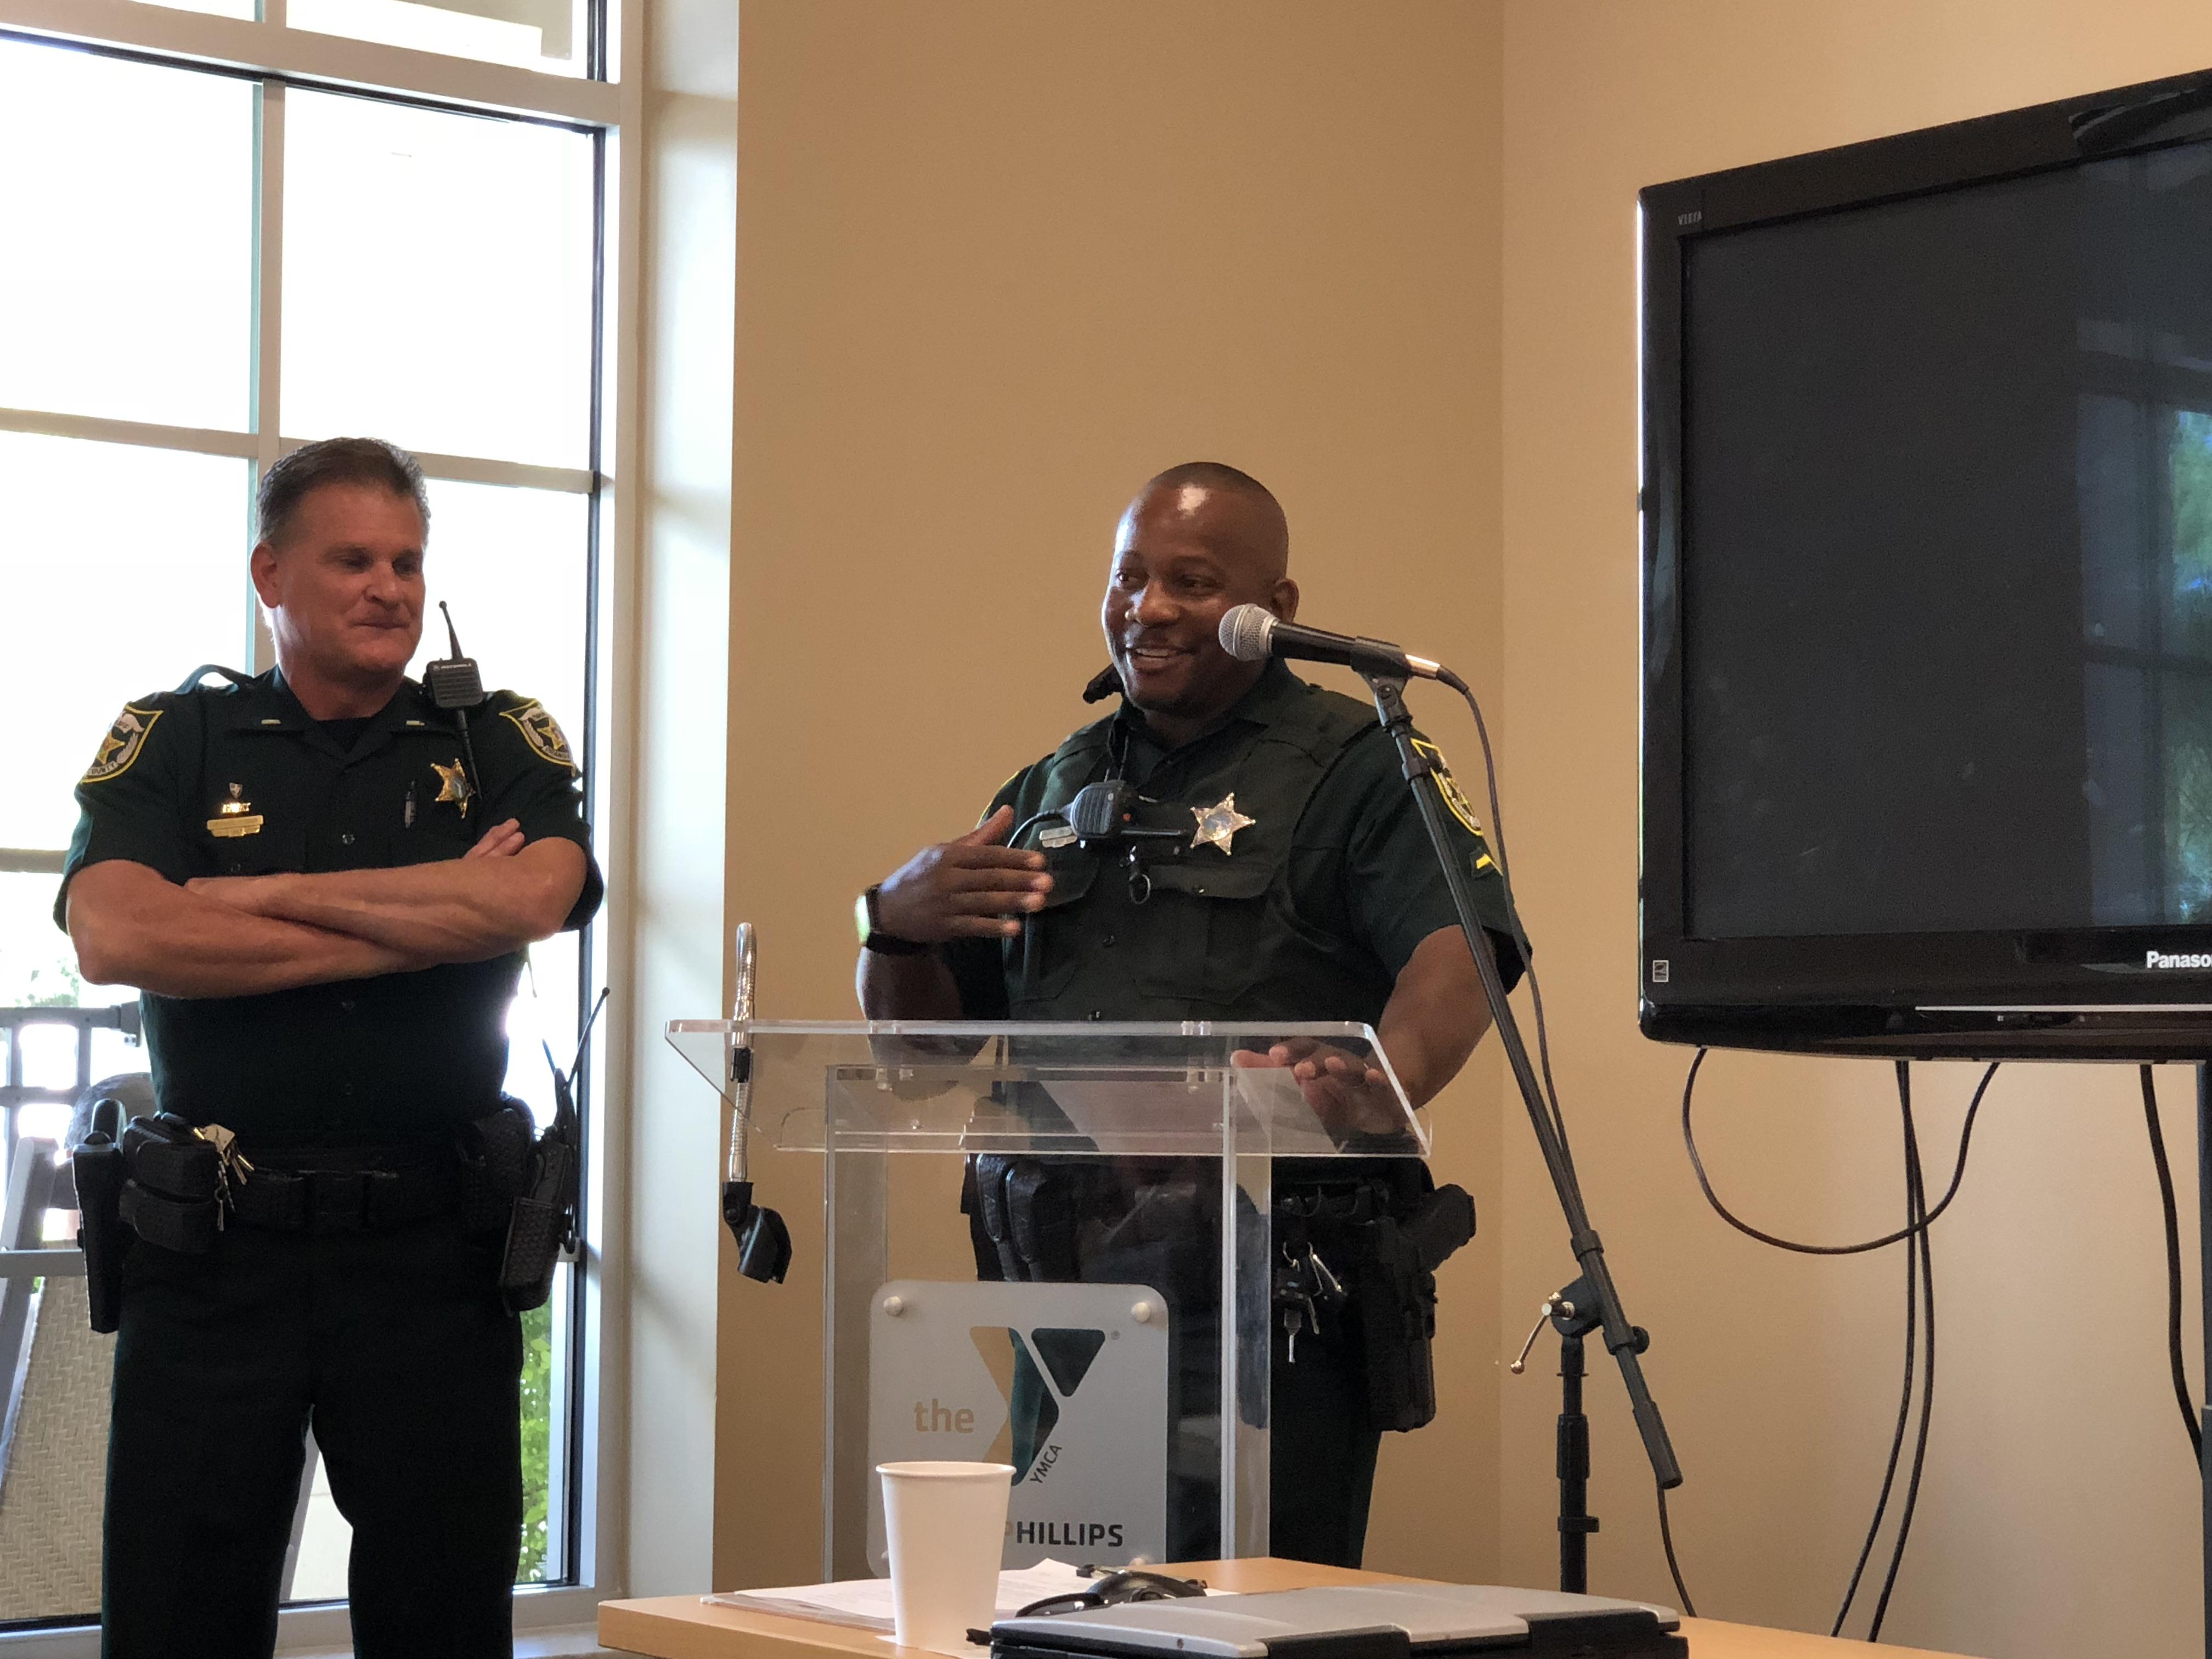 Lieutenant Rosier and Deputy Troutman